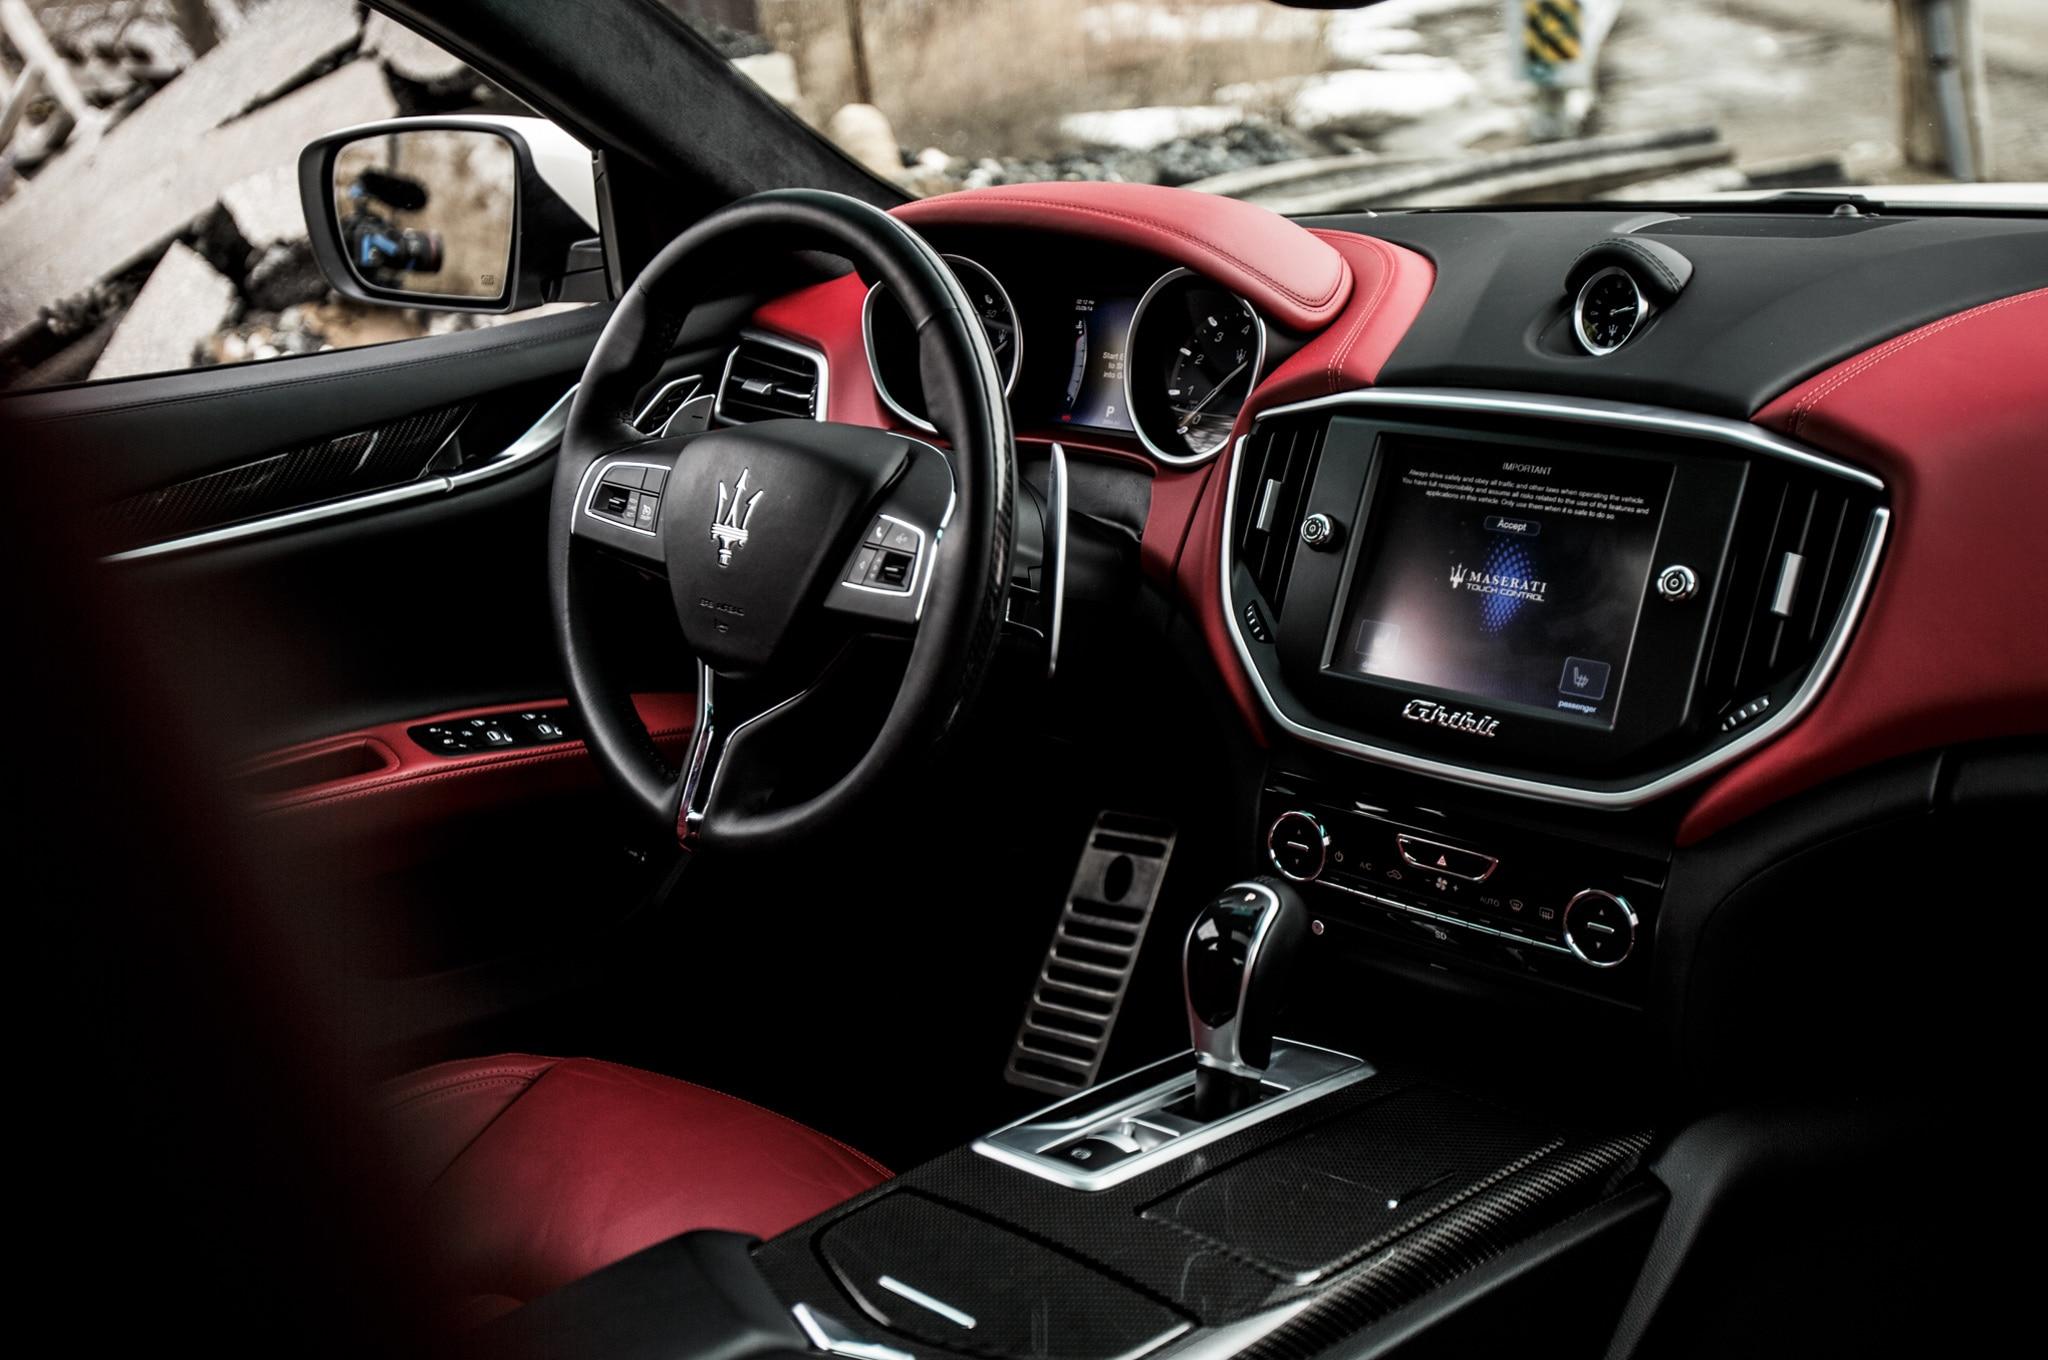 https://st.automobilemag.com/uploads/sites/11/2014/06/2014-Maserati-Ghibli-S-Q4-interior.jpg